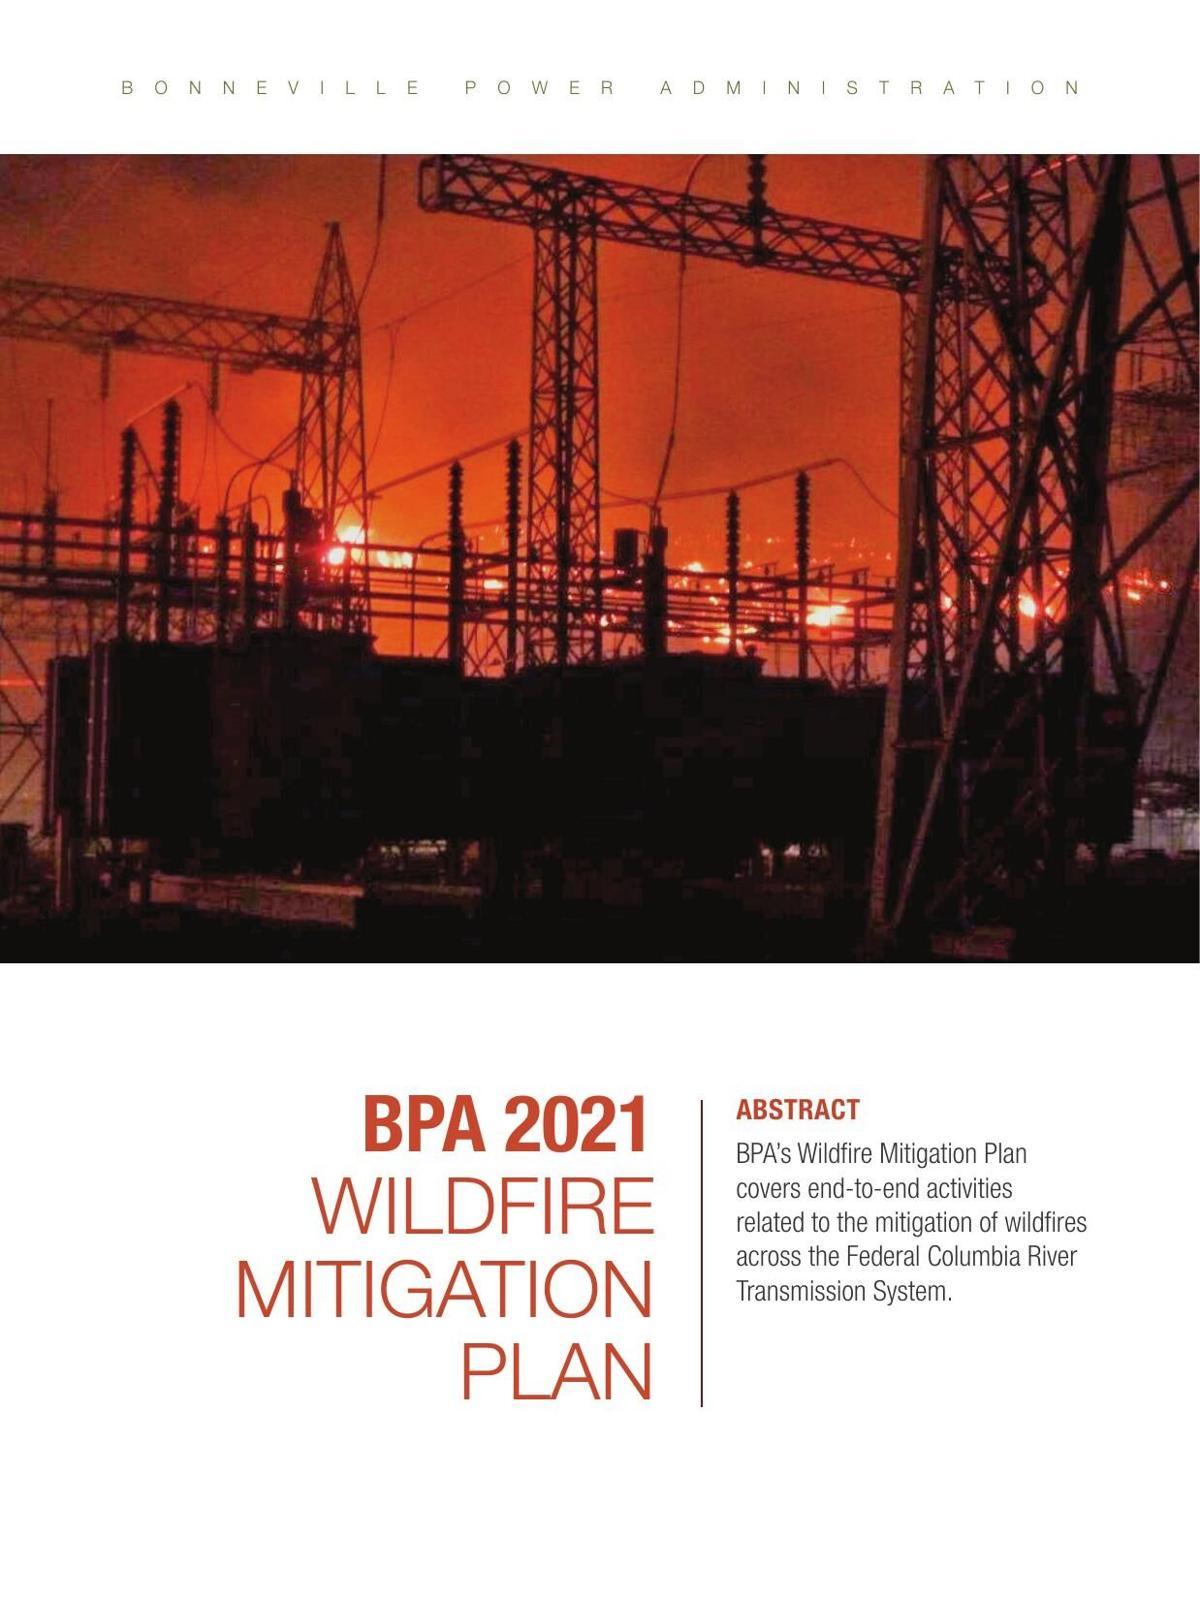 BPA Wildfire Mitigation Plan